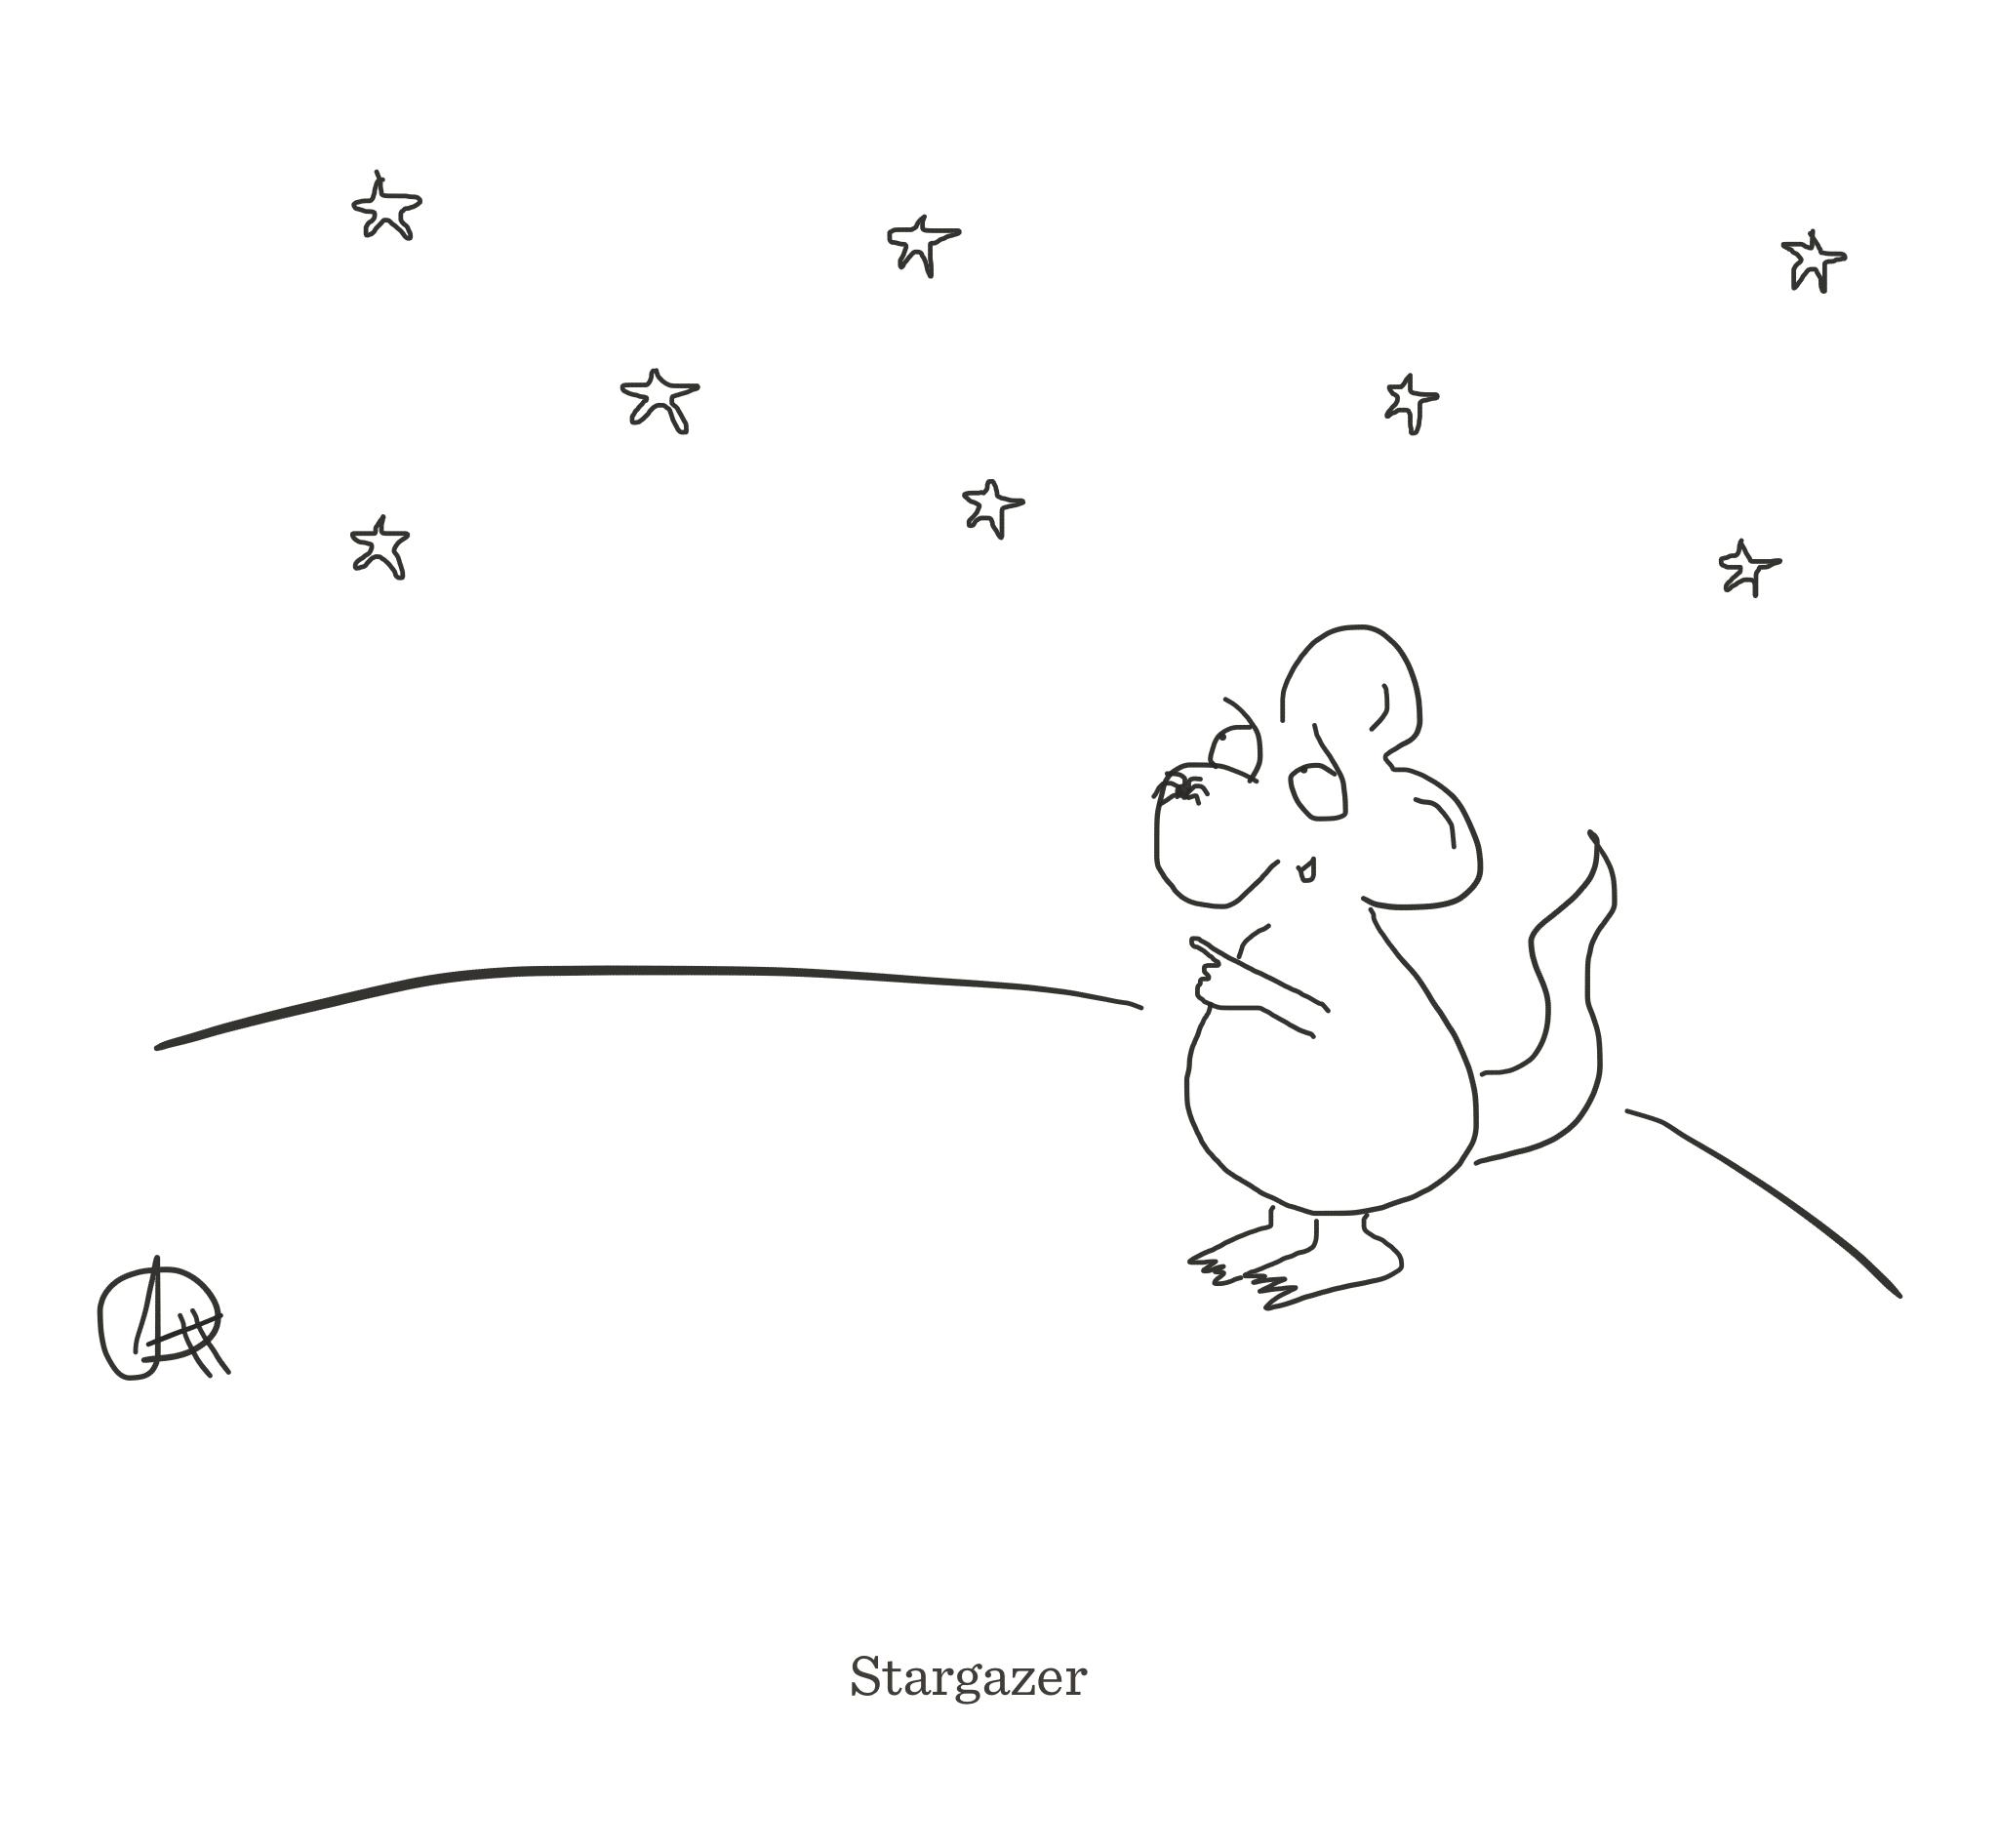 Stargazer, The Happy Rat cartoon